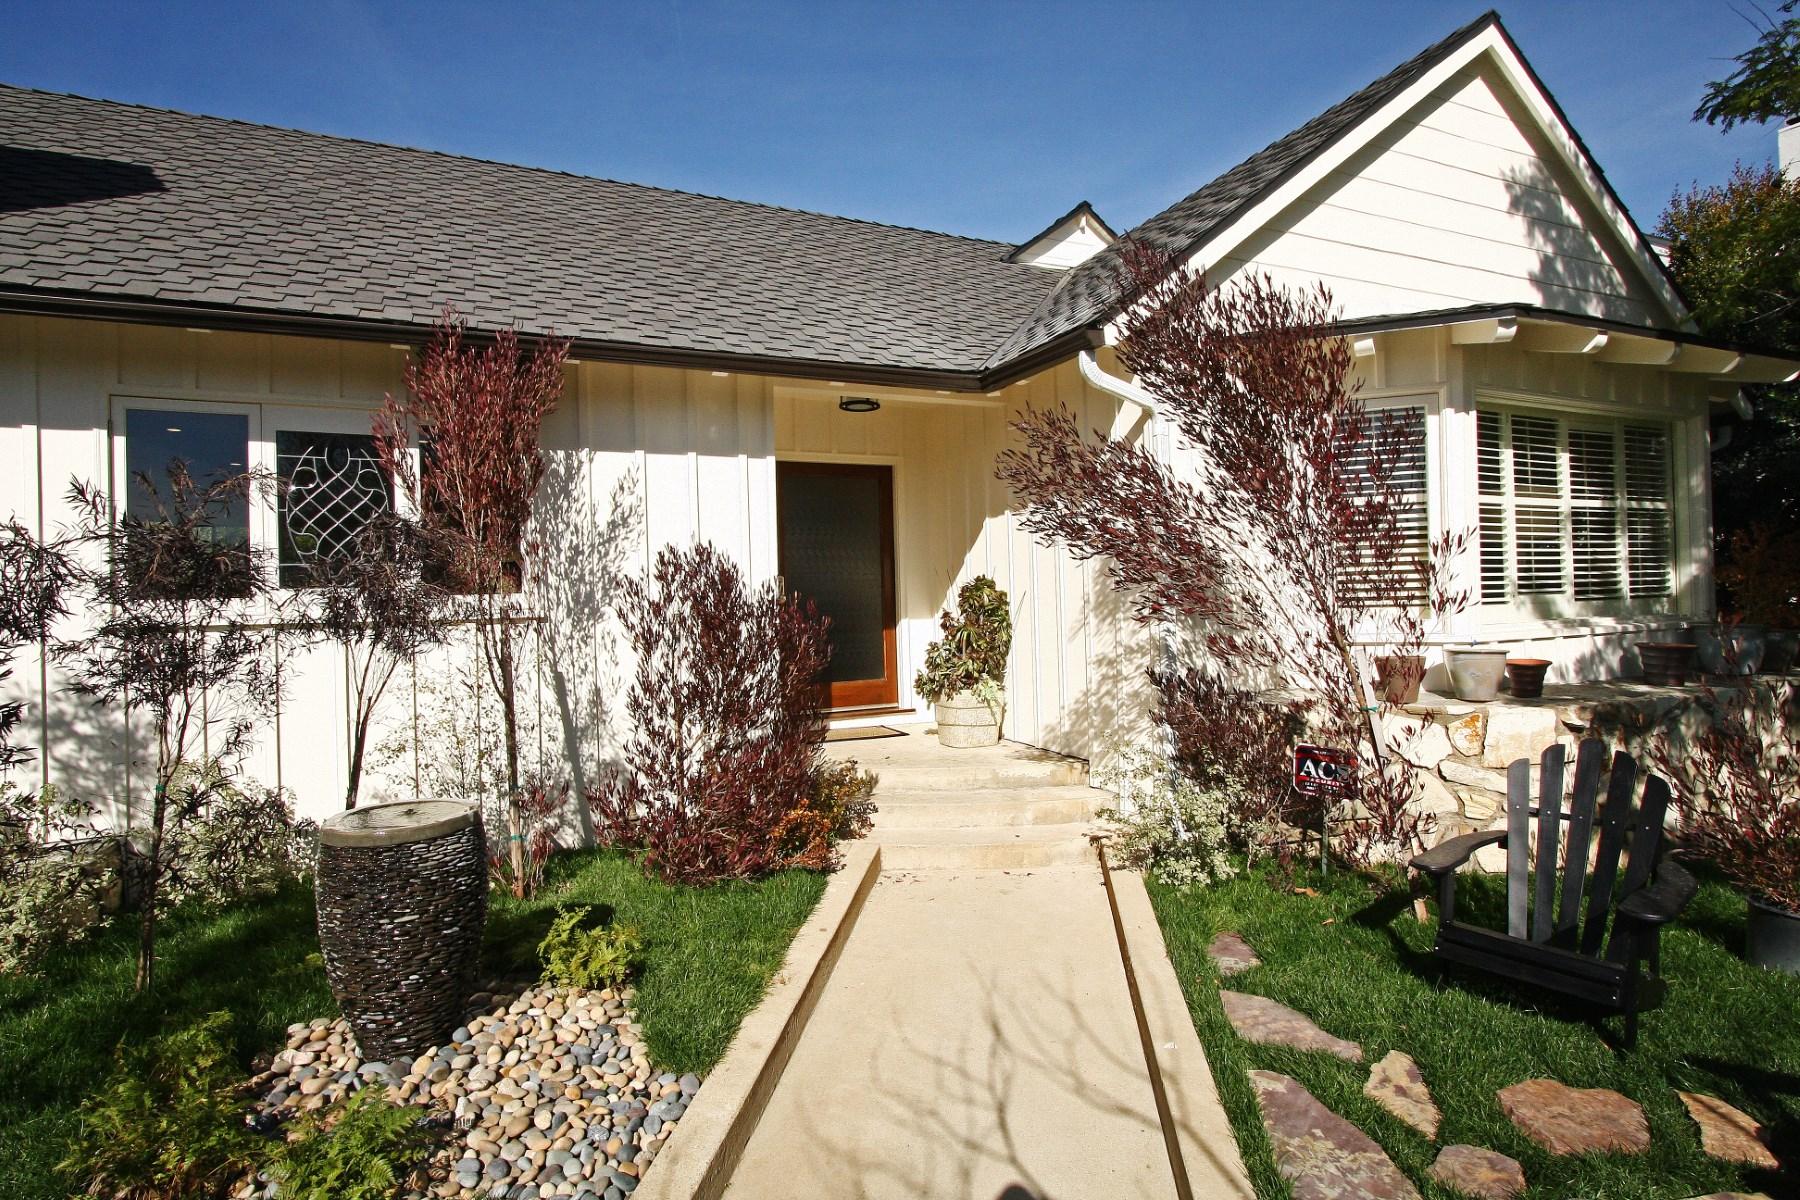 独户住宅 为 销售 在 Remodeled Classic Traditional 11365 Thurston Place 洛杉矶, 加利福尼亚州, 90049 美国